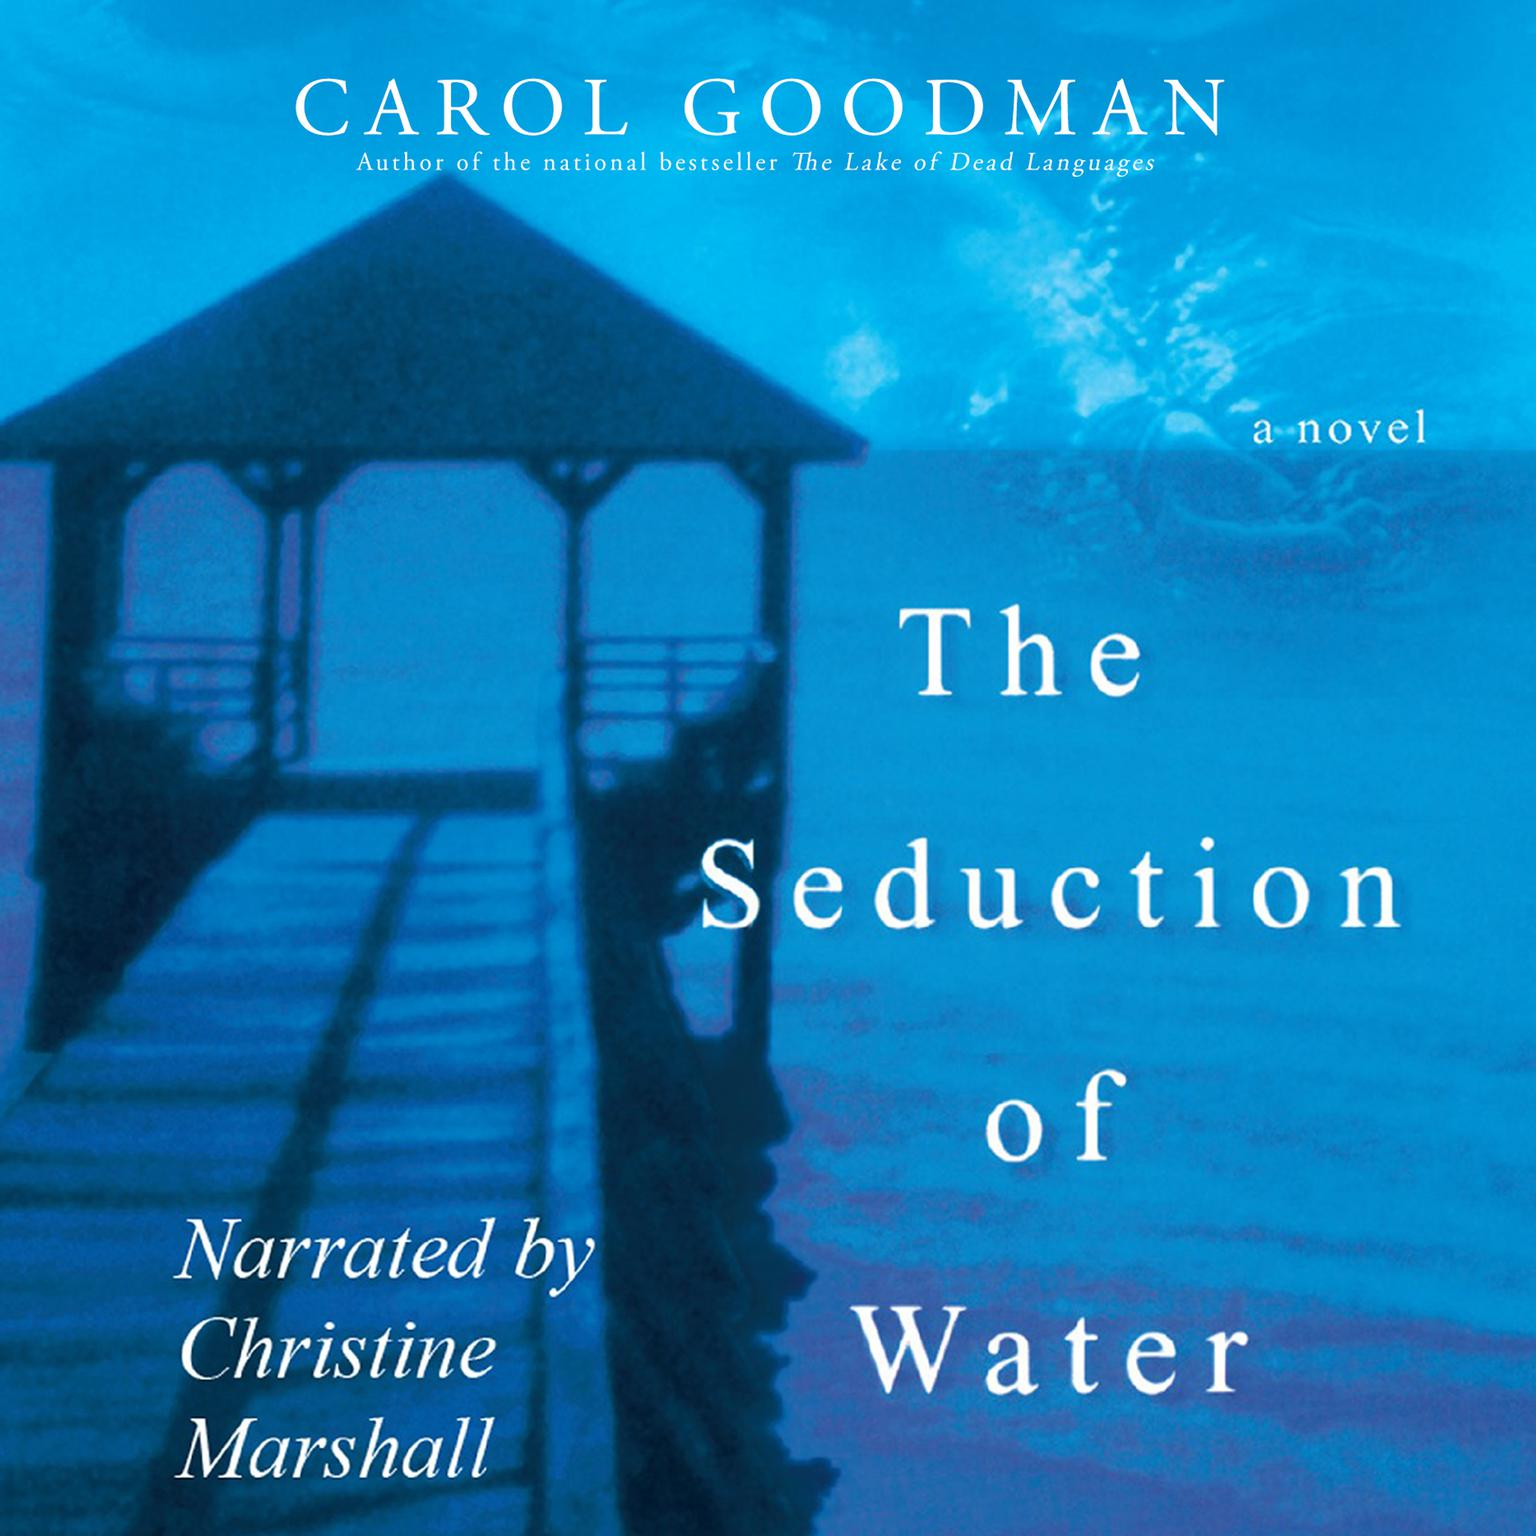 The Seduction of Water Audiobook, by Carol Goodman